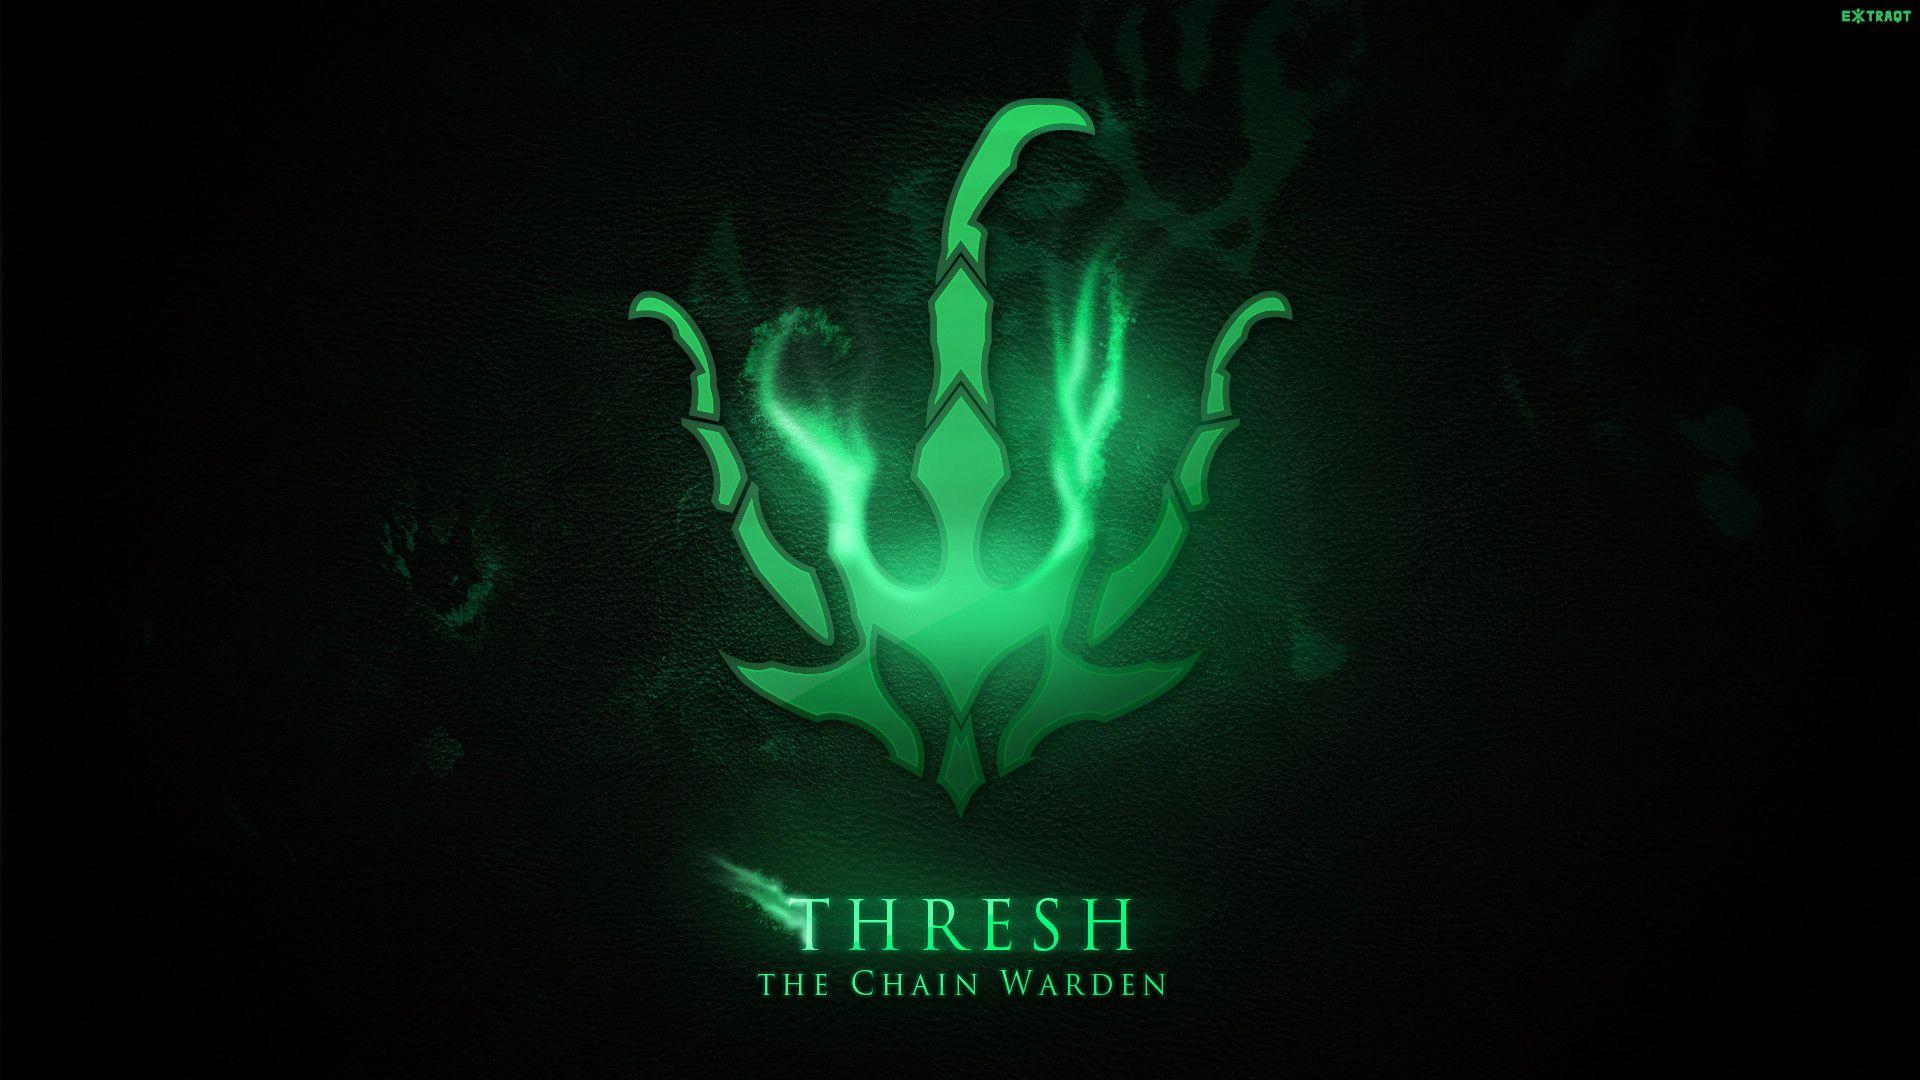 Thresh League Of Legends Lol Champions League Of Legends Game